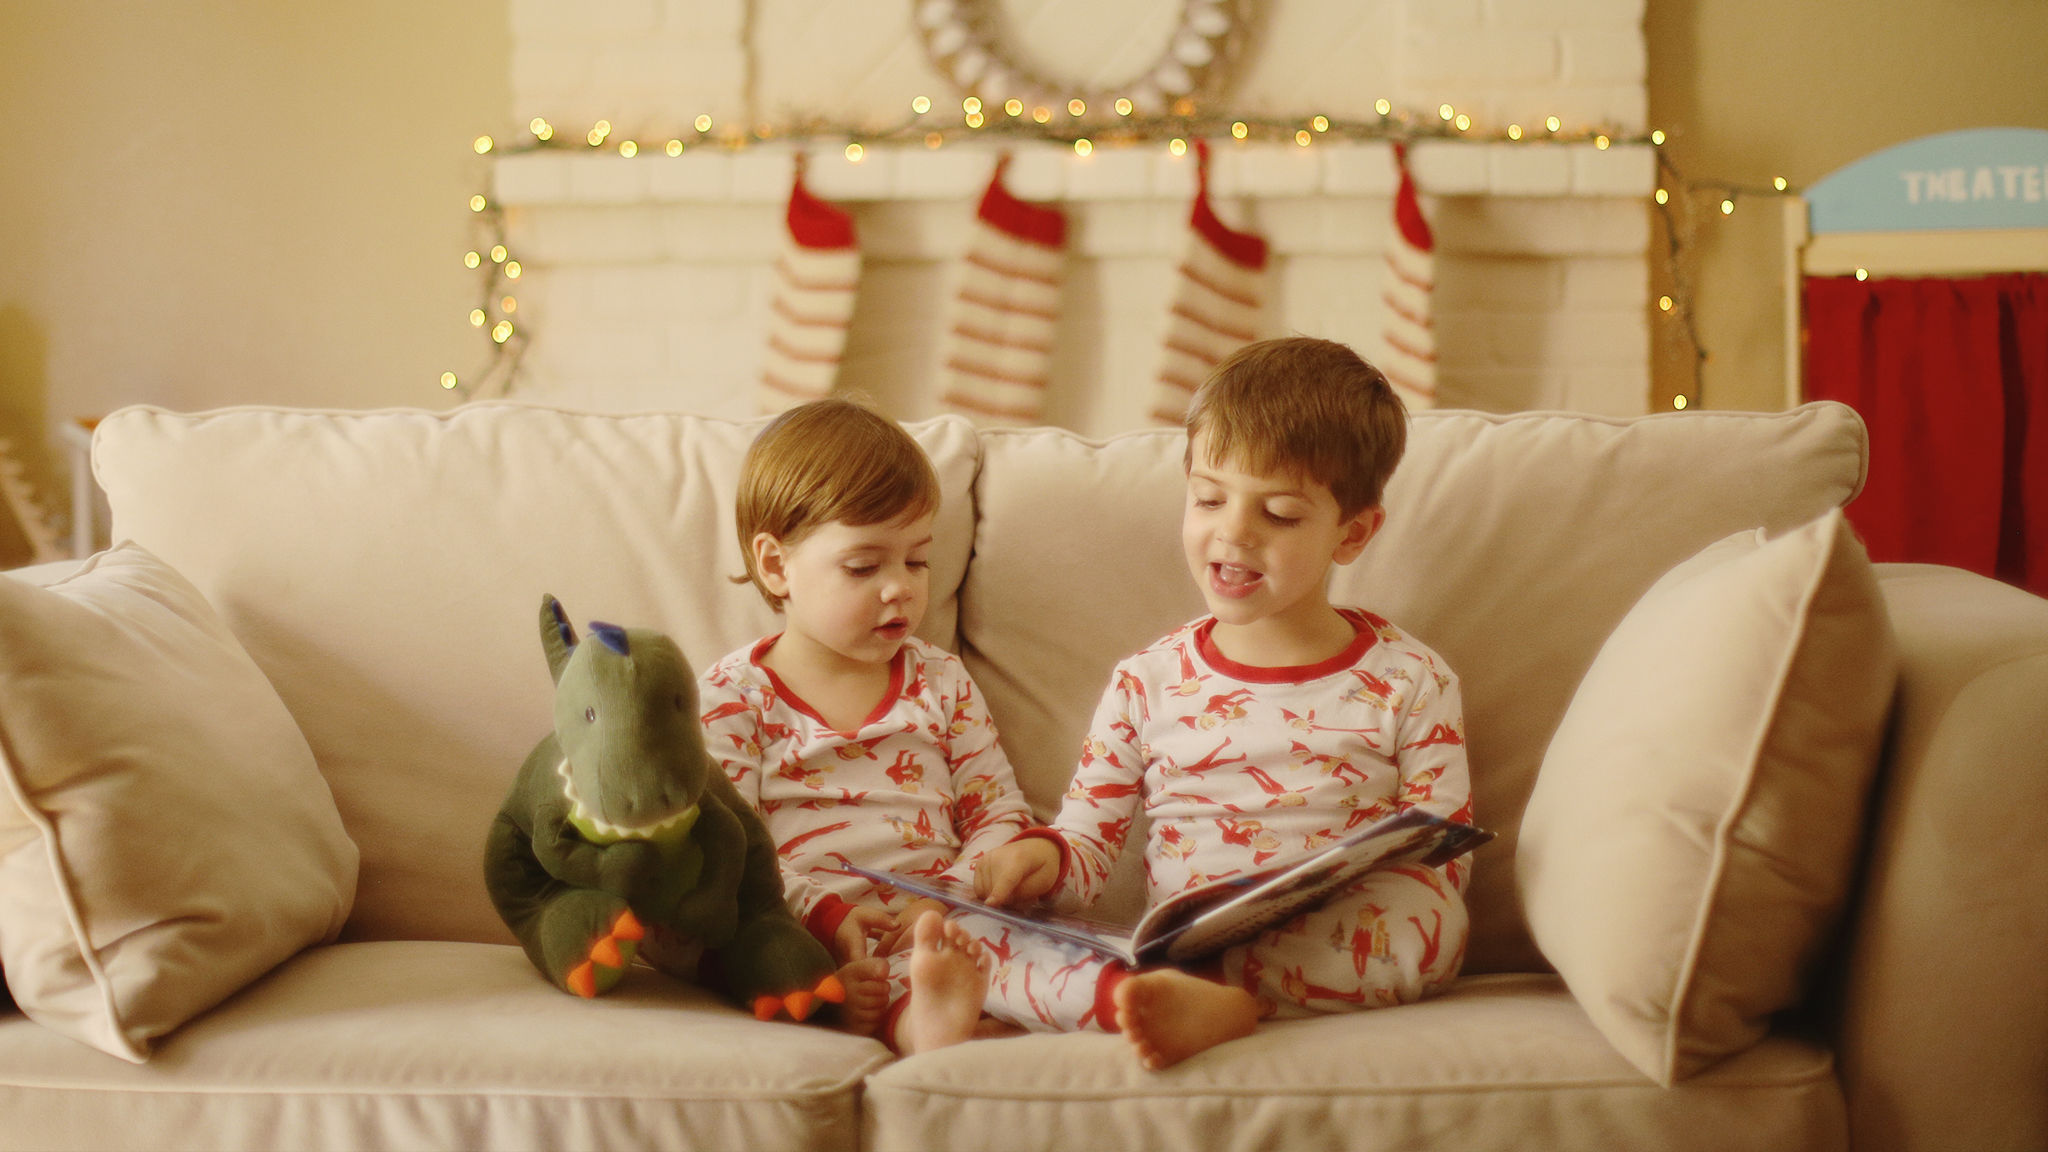 Make This Your Christmas Eve Tradition